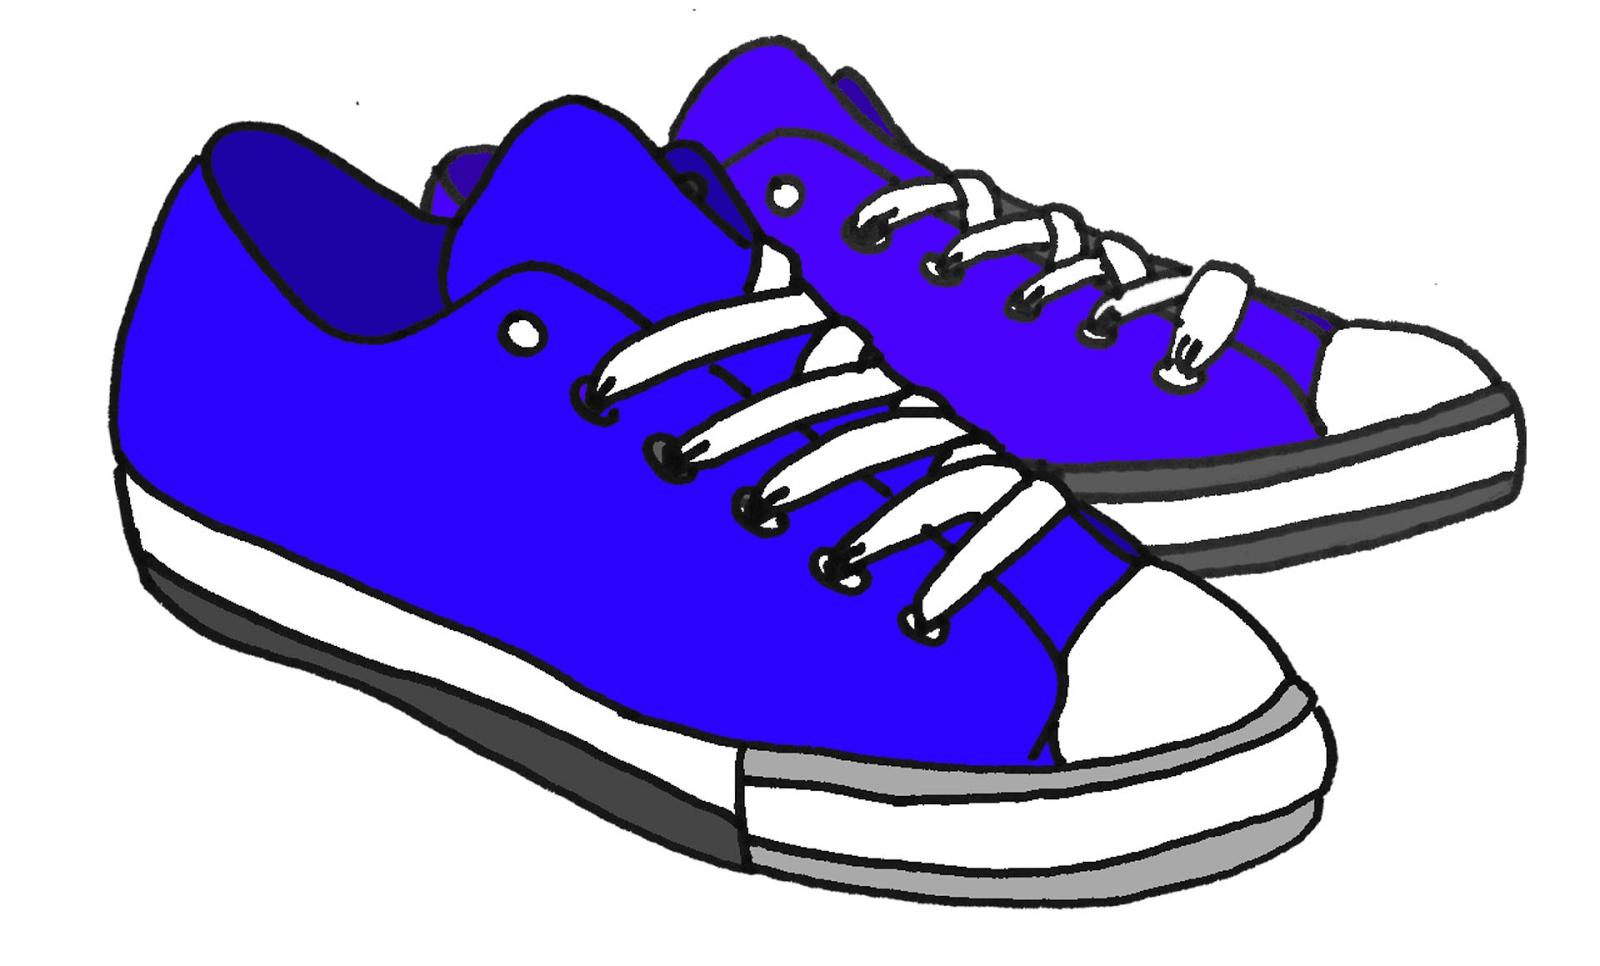 Cartoon shoe clipart svg black and white stock Cartoon Shoes Cliparts - Cliparts Zone svg black and white stock